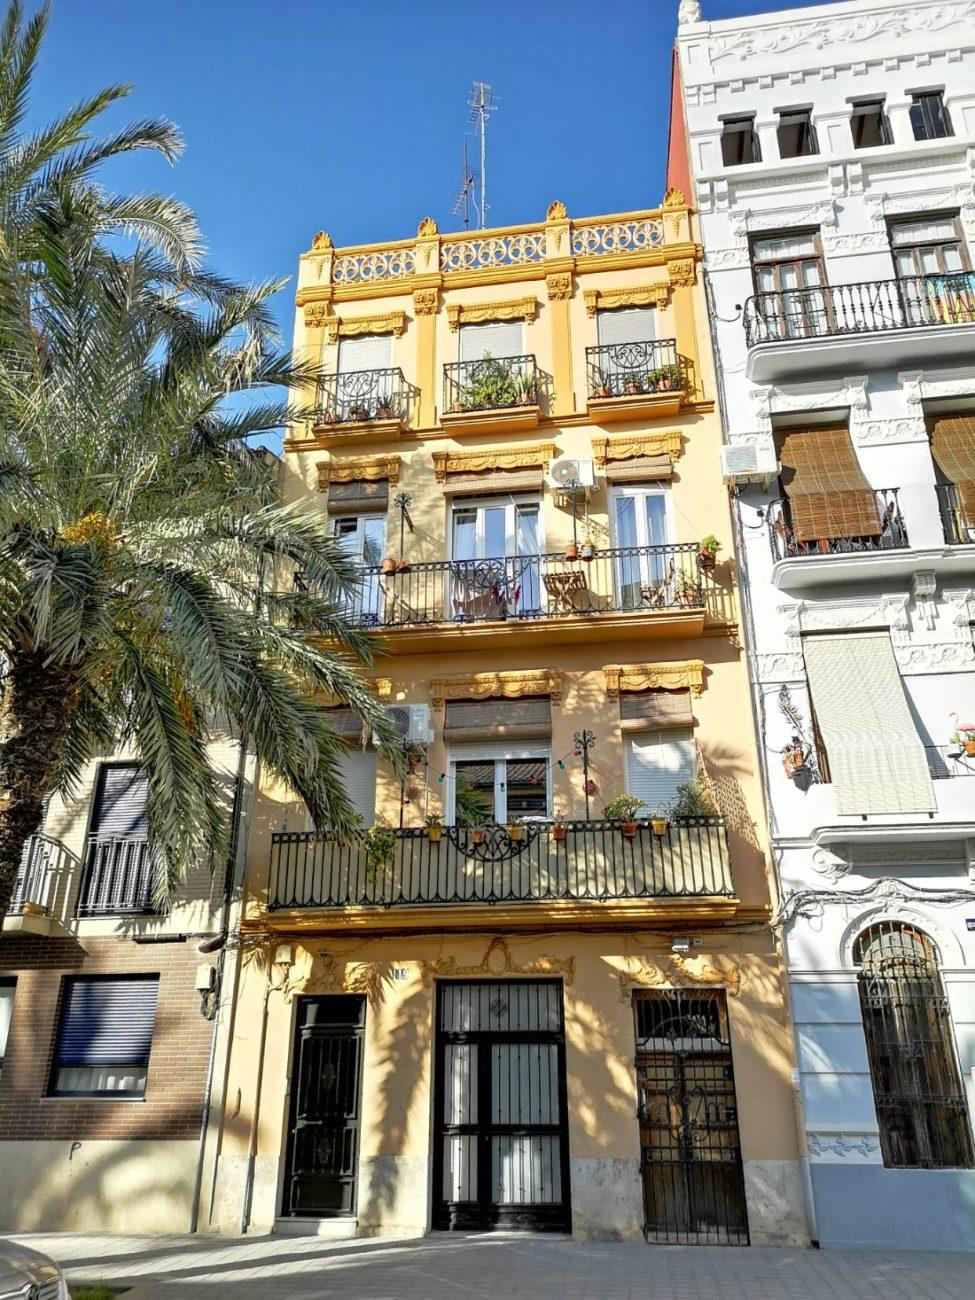 kamienice ulice walencja hiszpania